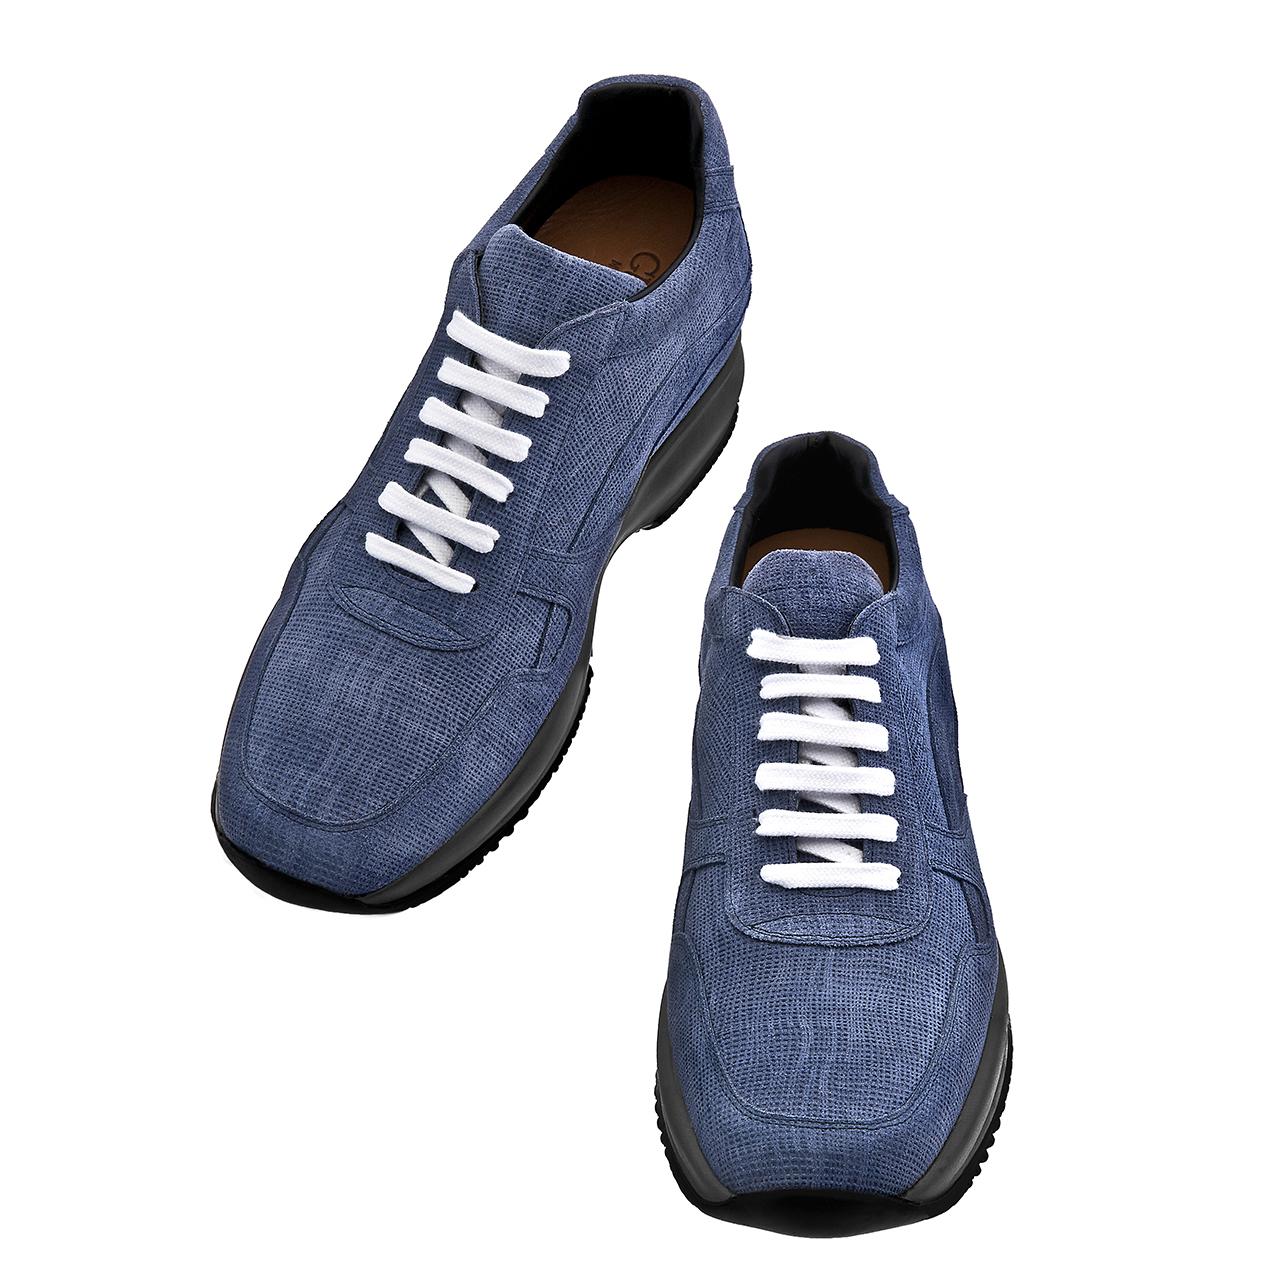 Lyon Tall men Shoes | Guidomaggi Shoes